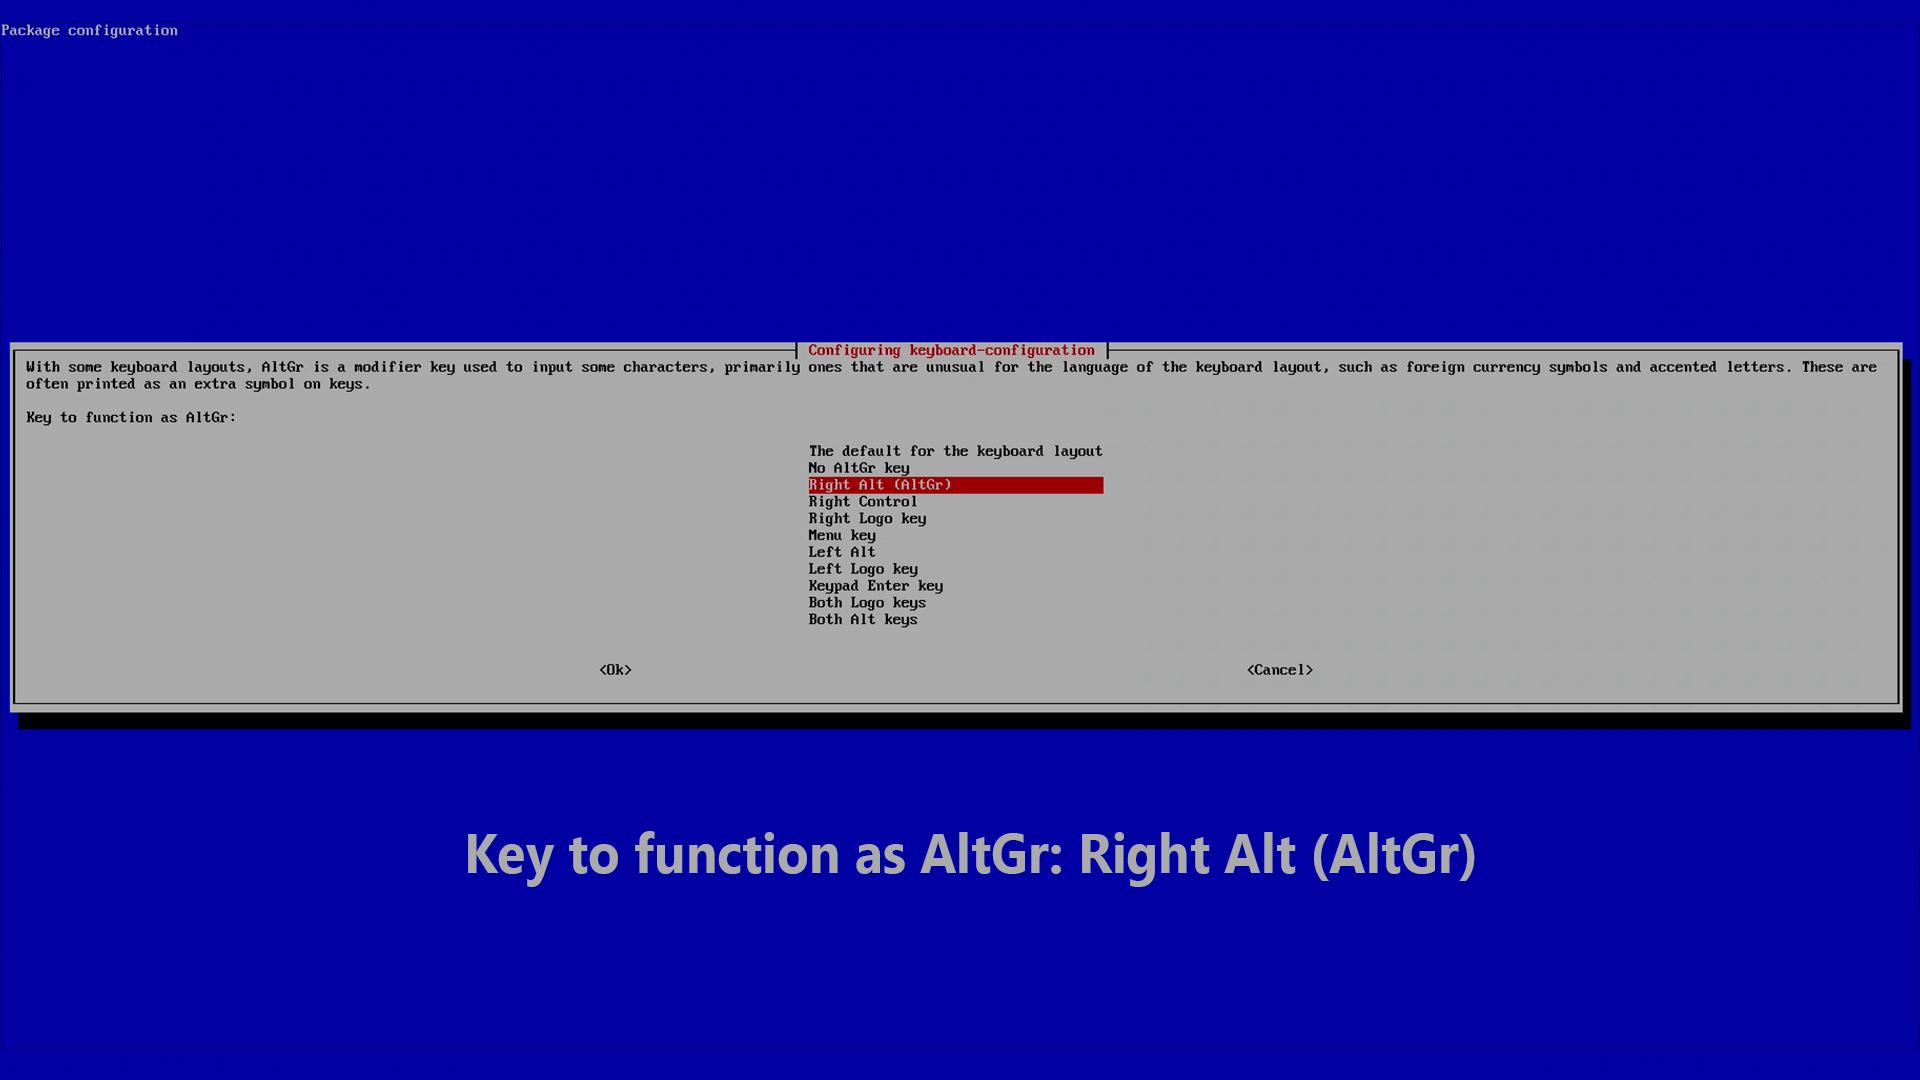 DigitaleWelt RetroPie Anleitung - Right Alt (AltGr)